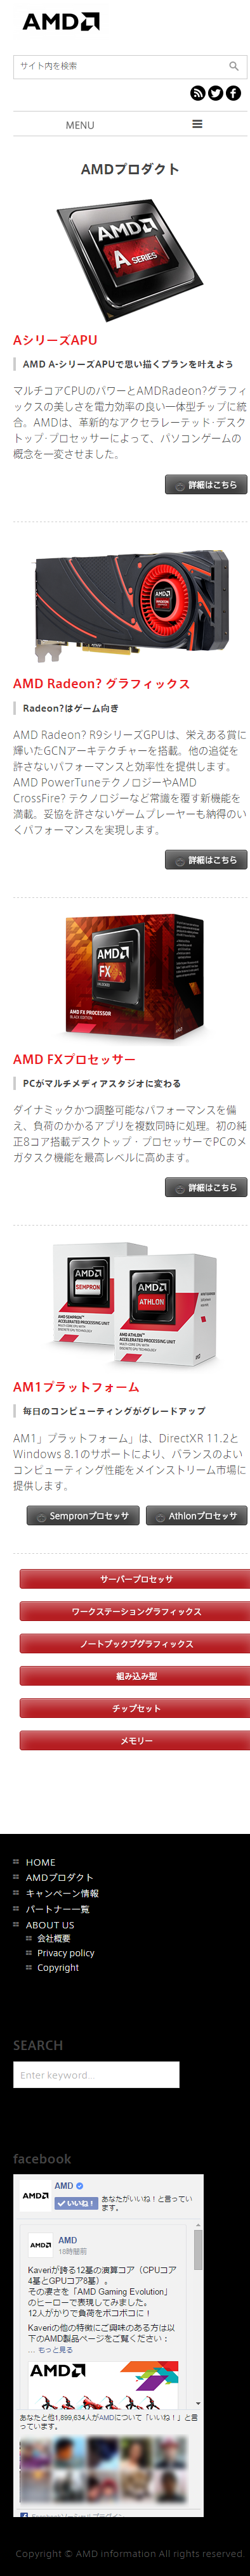 AMDプロダクト   AMD information 03